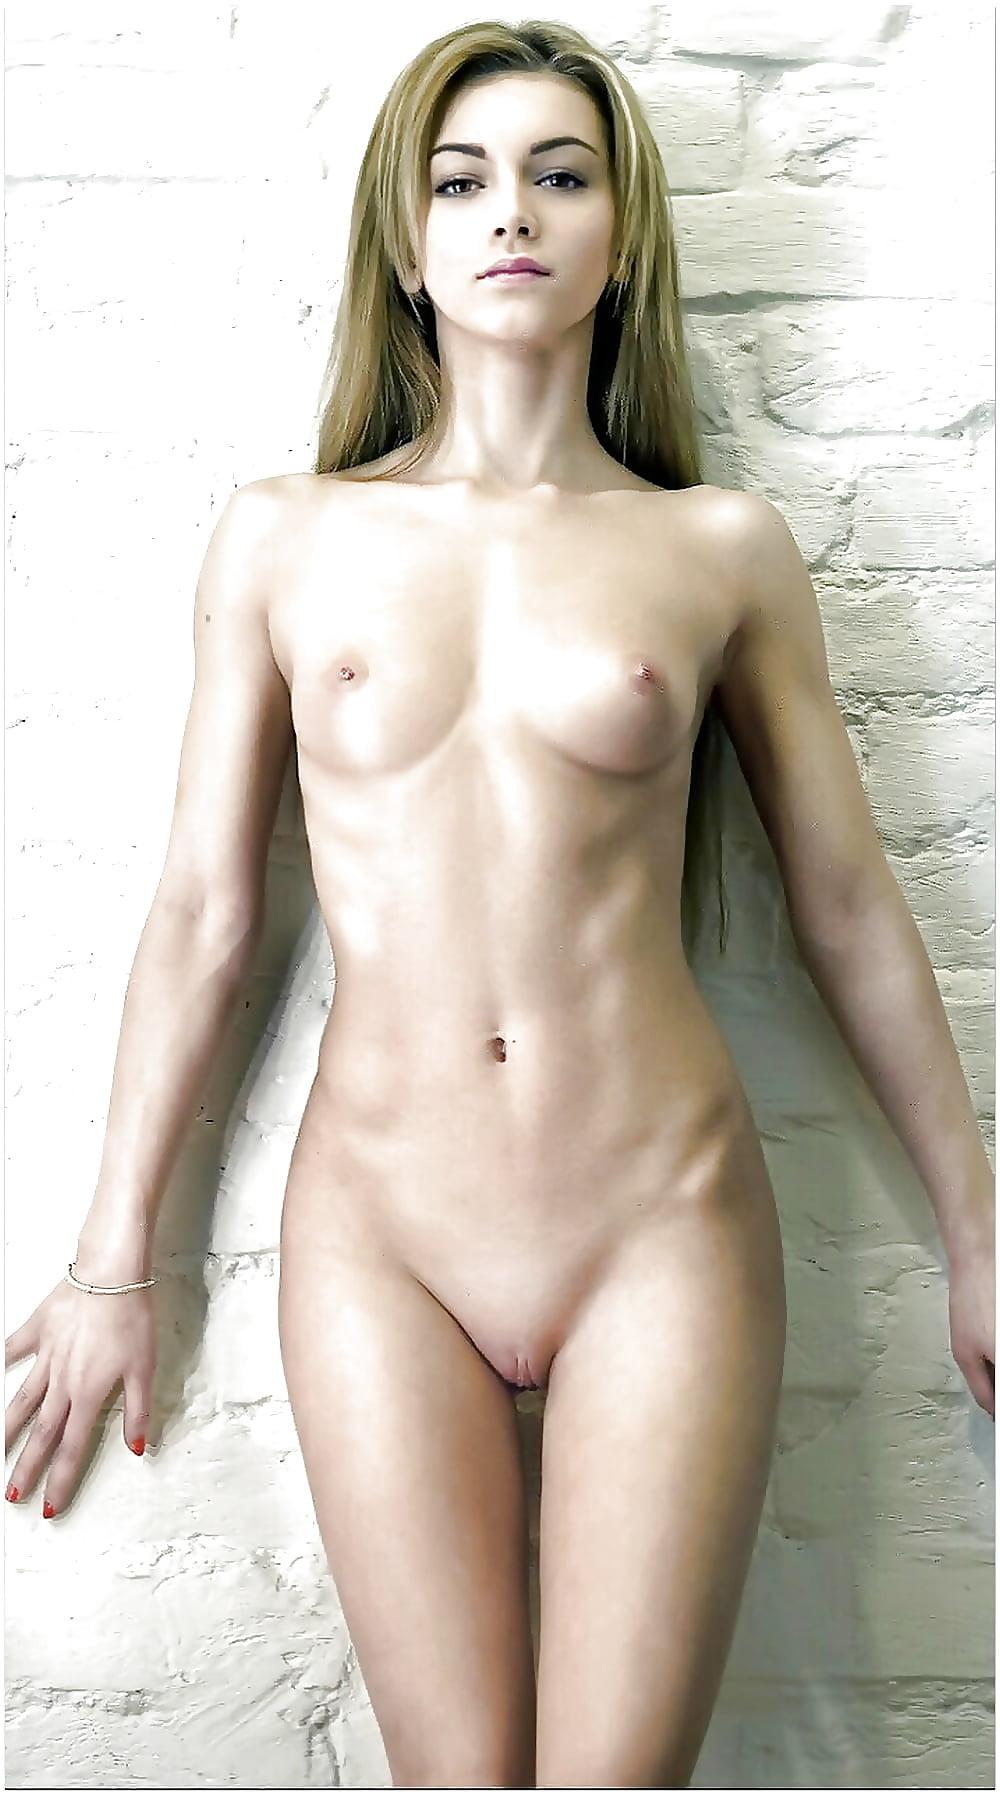 Nude smooth skinny #12